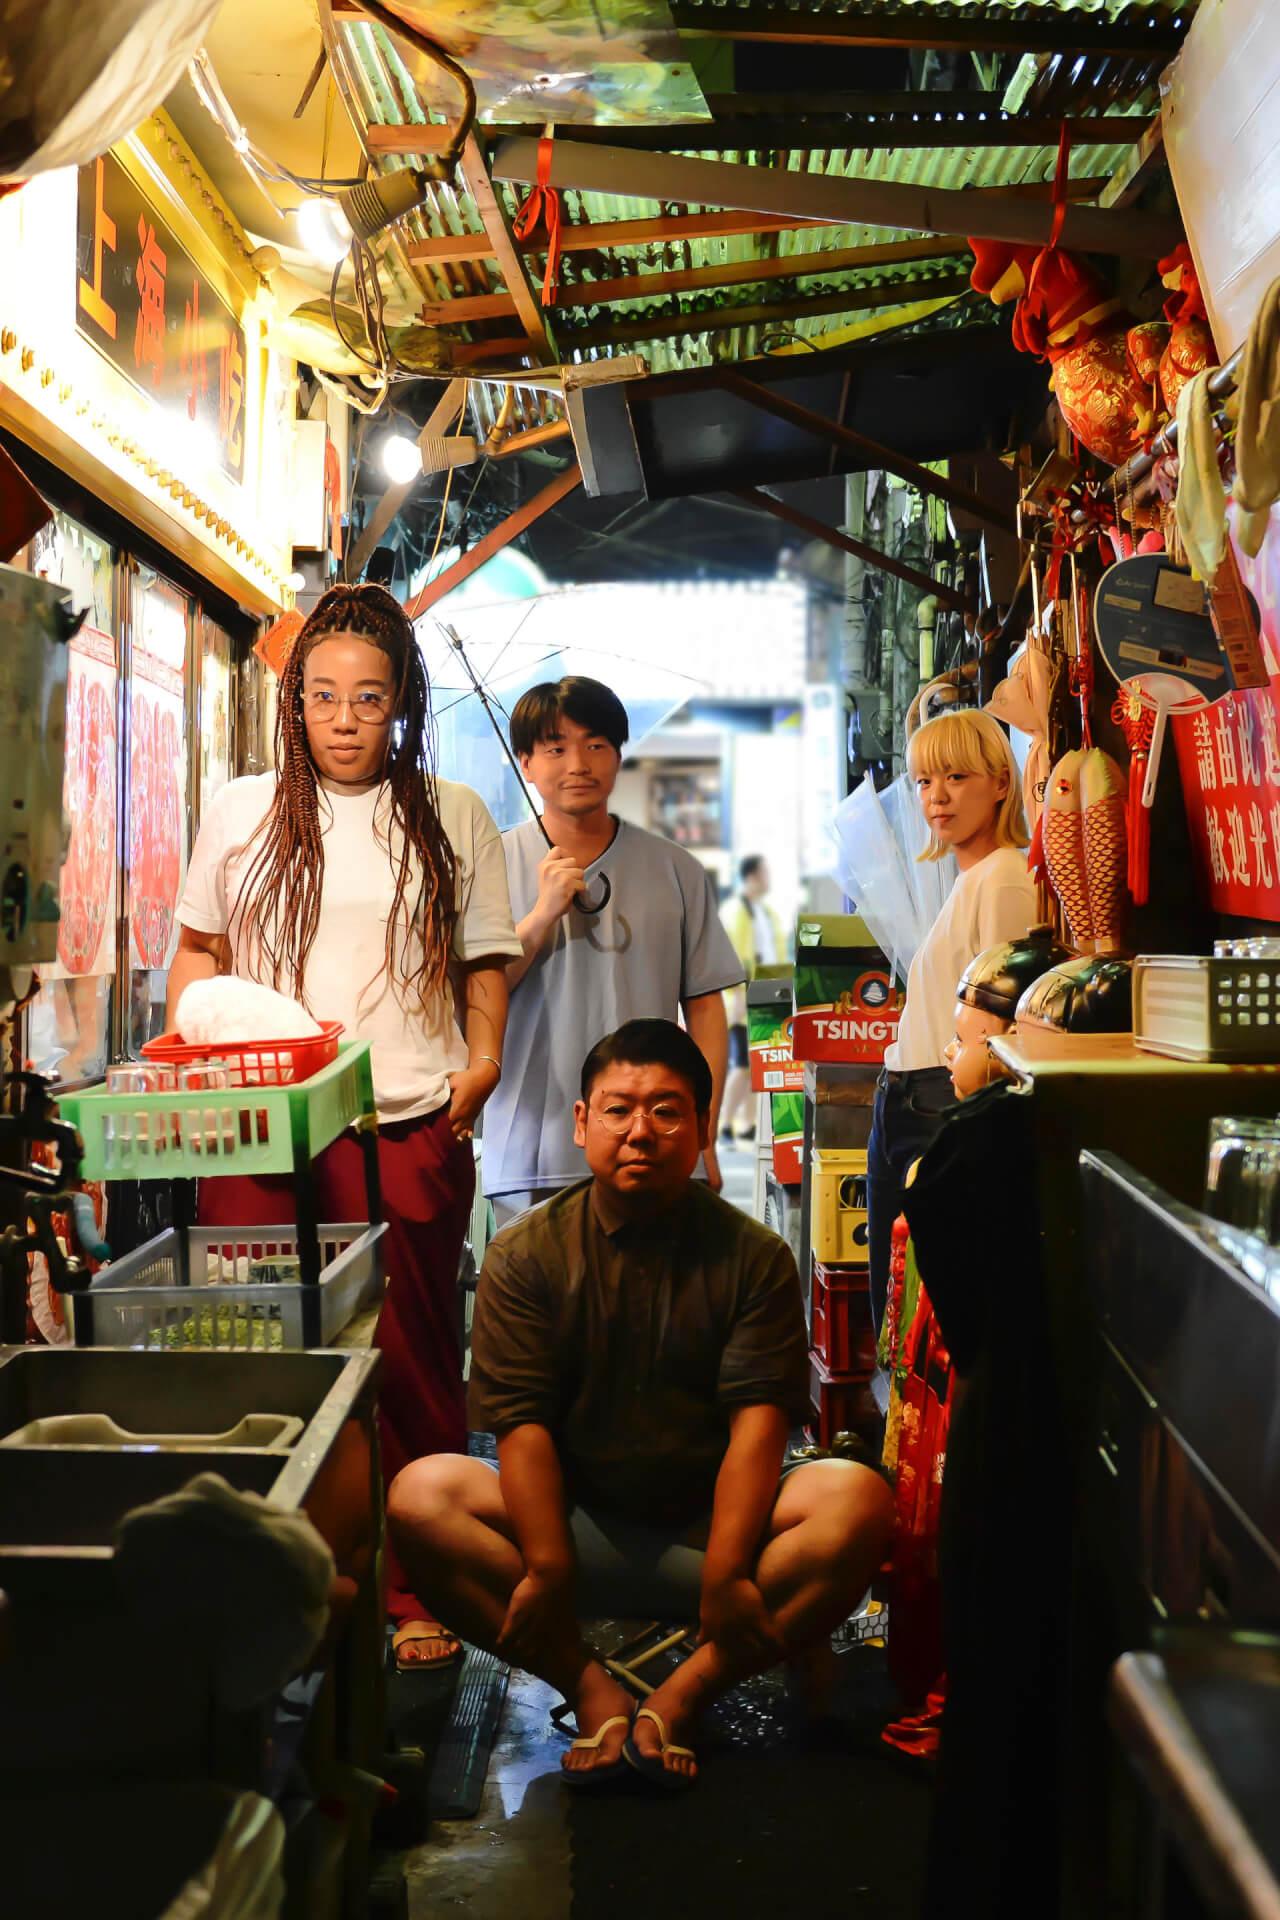 VIDEOTAPEMUSIC&んoonが初の2マンライブをWWW Xにて有観客で開催決定! music201210_VIDEOTAPEMUSIC_noon_wwwx_3